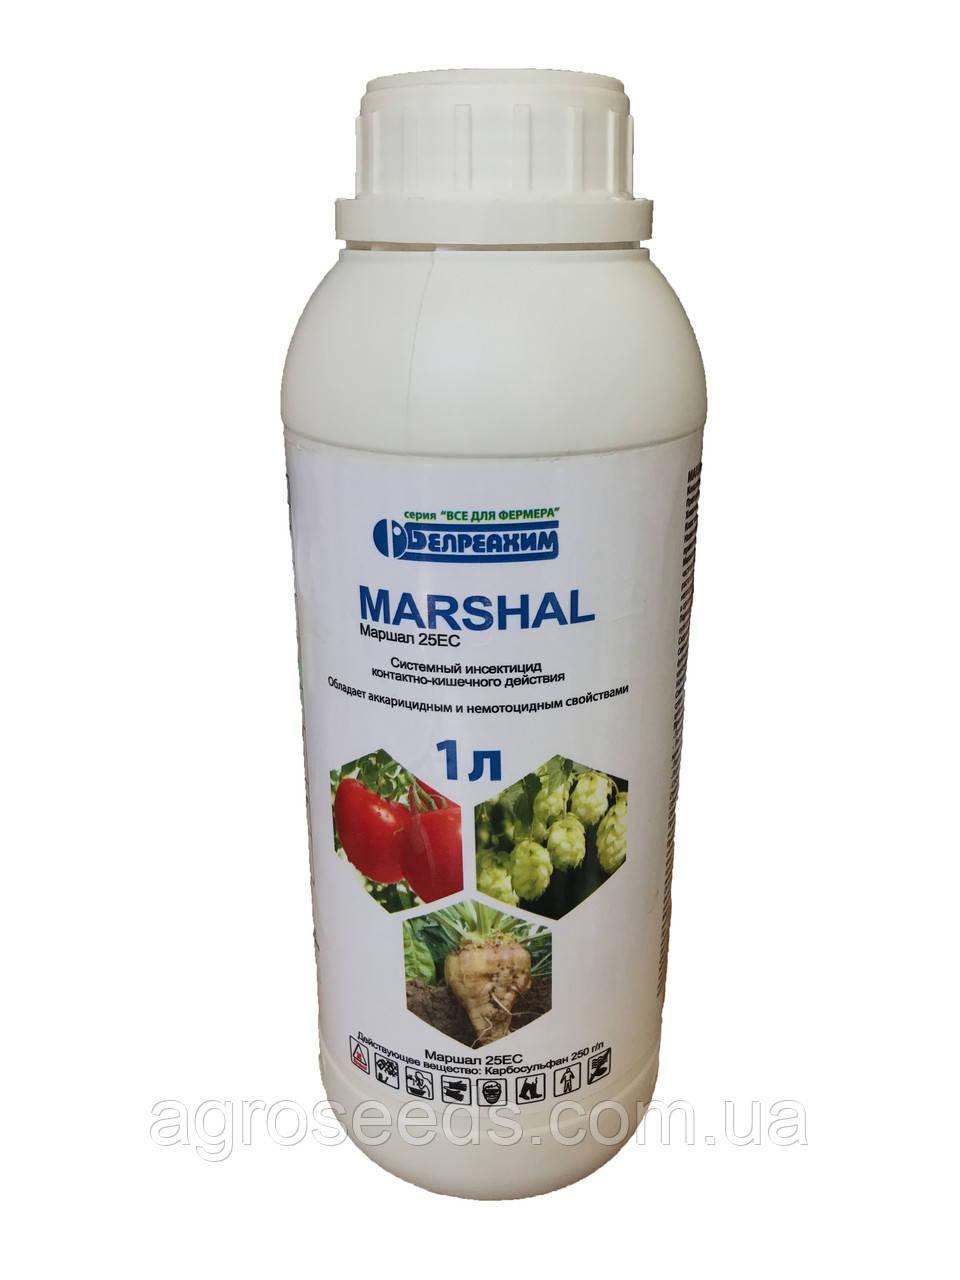 Инсектицид Маршал 1 л